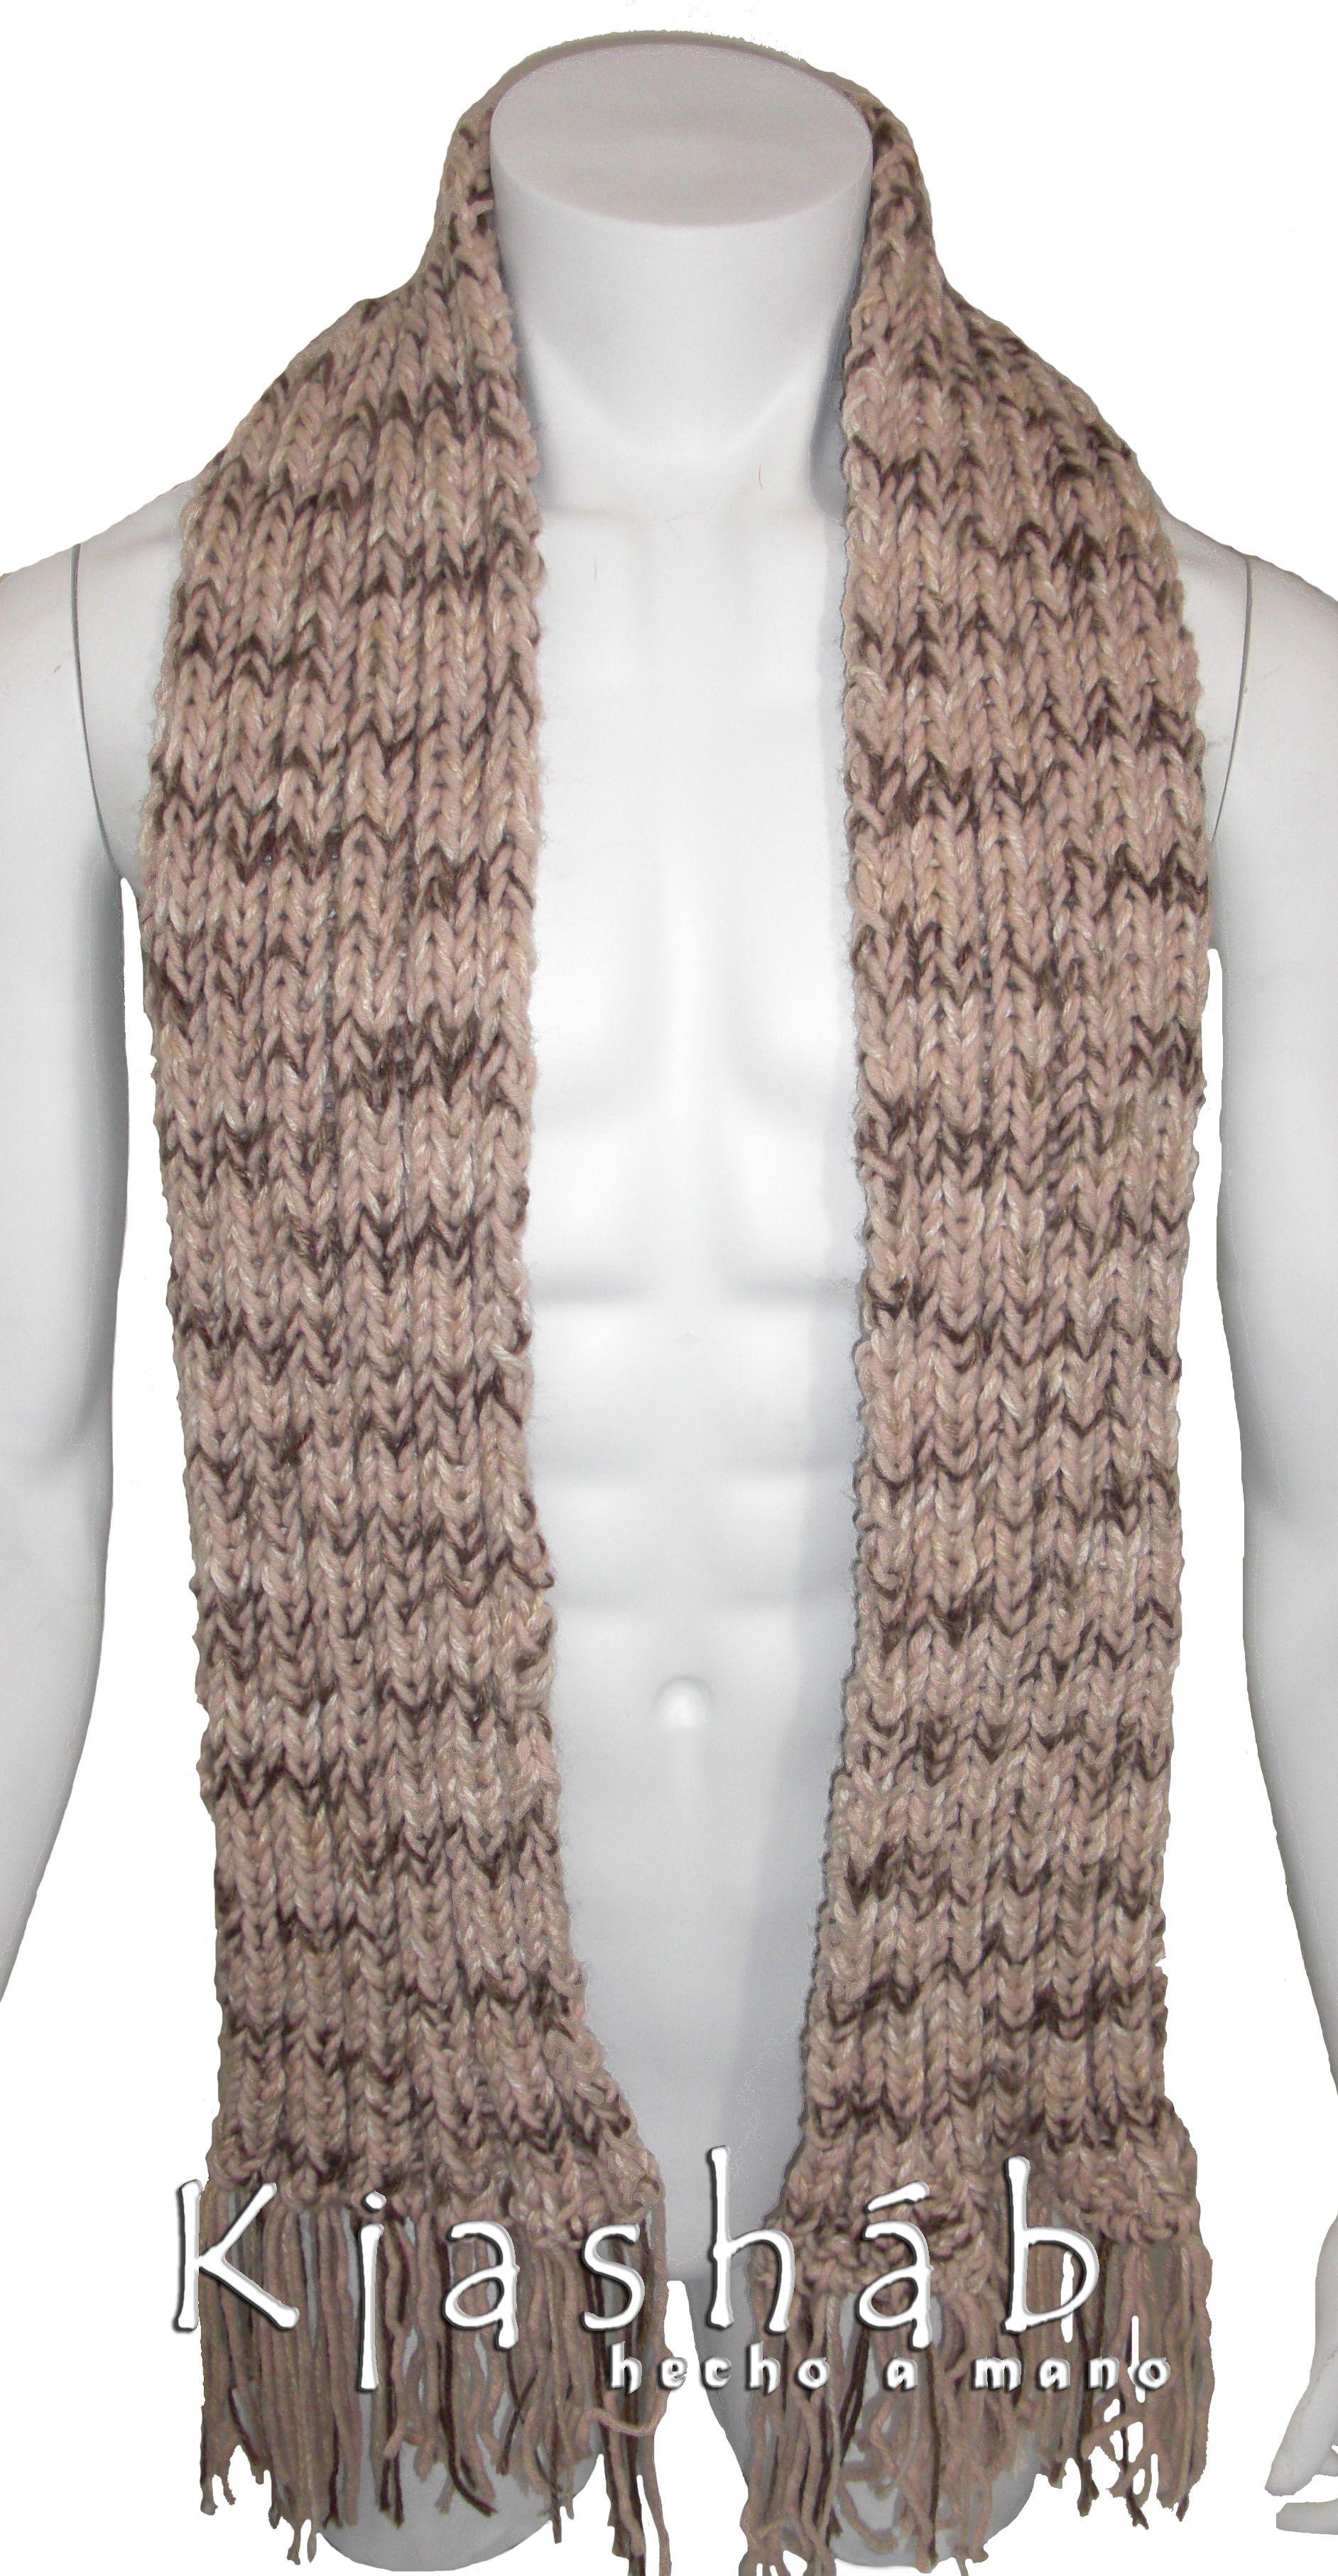 Bufanda de hombre, tejida en dos agujas. | Dos agujas | Pinterest